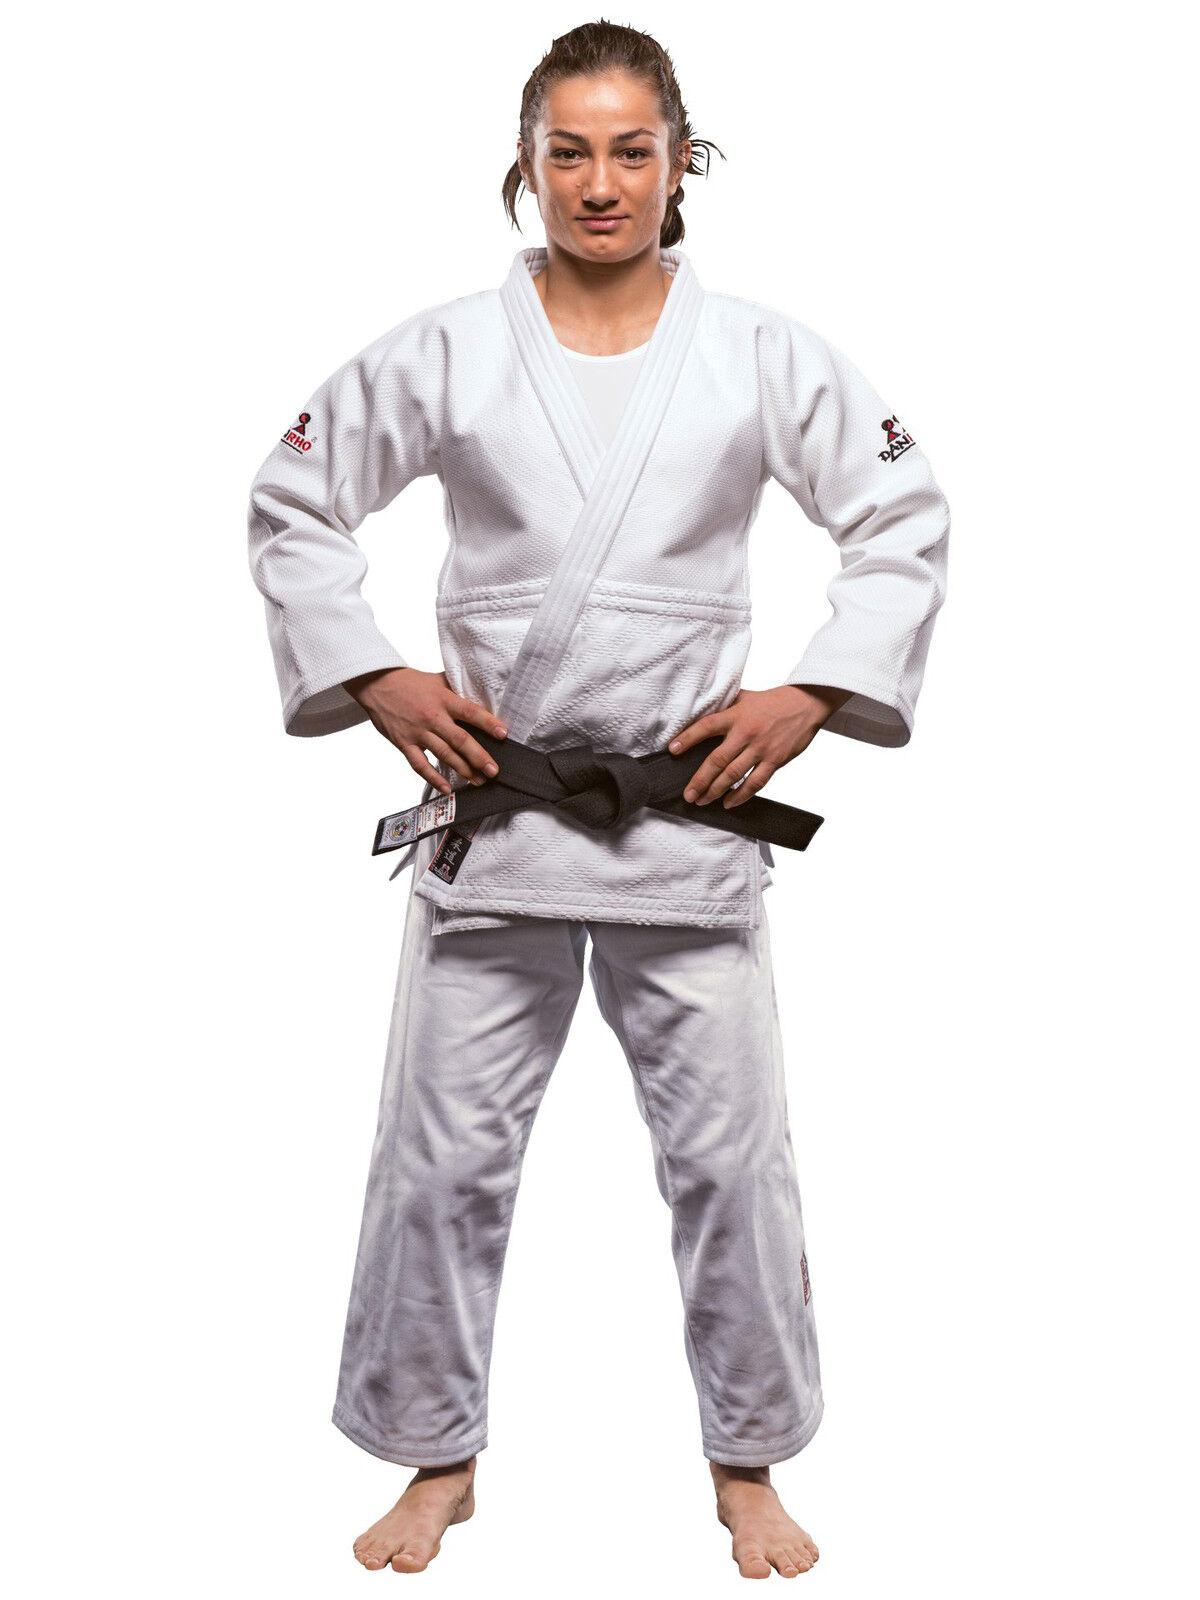 Kwon- Kwon- Kwon- Judo Anzug  Ultimate  750 IJF weiß. Gi. Kimono. 150-200 in M. Baumwolle. 05265e